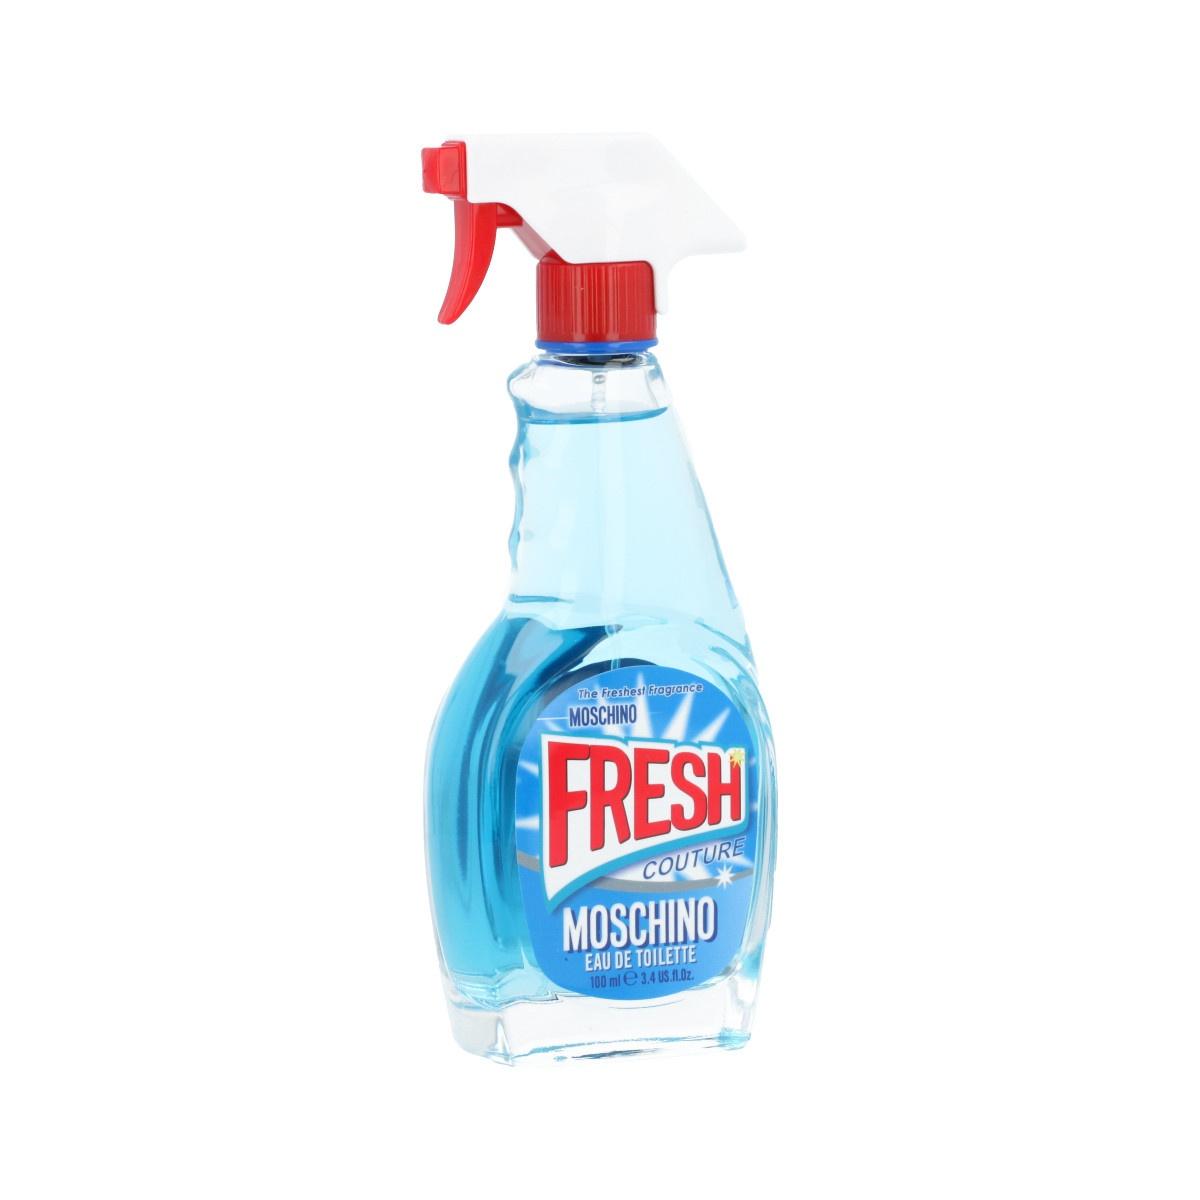 Image of Moschino Fresh Couture - Eau de Toilette 100 ml